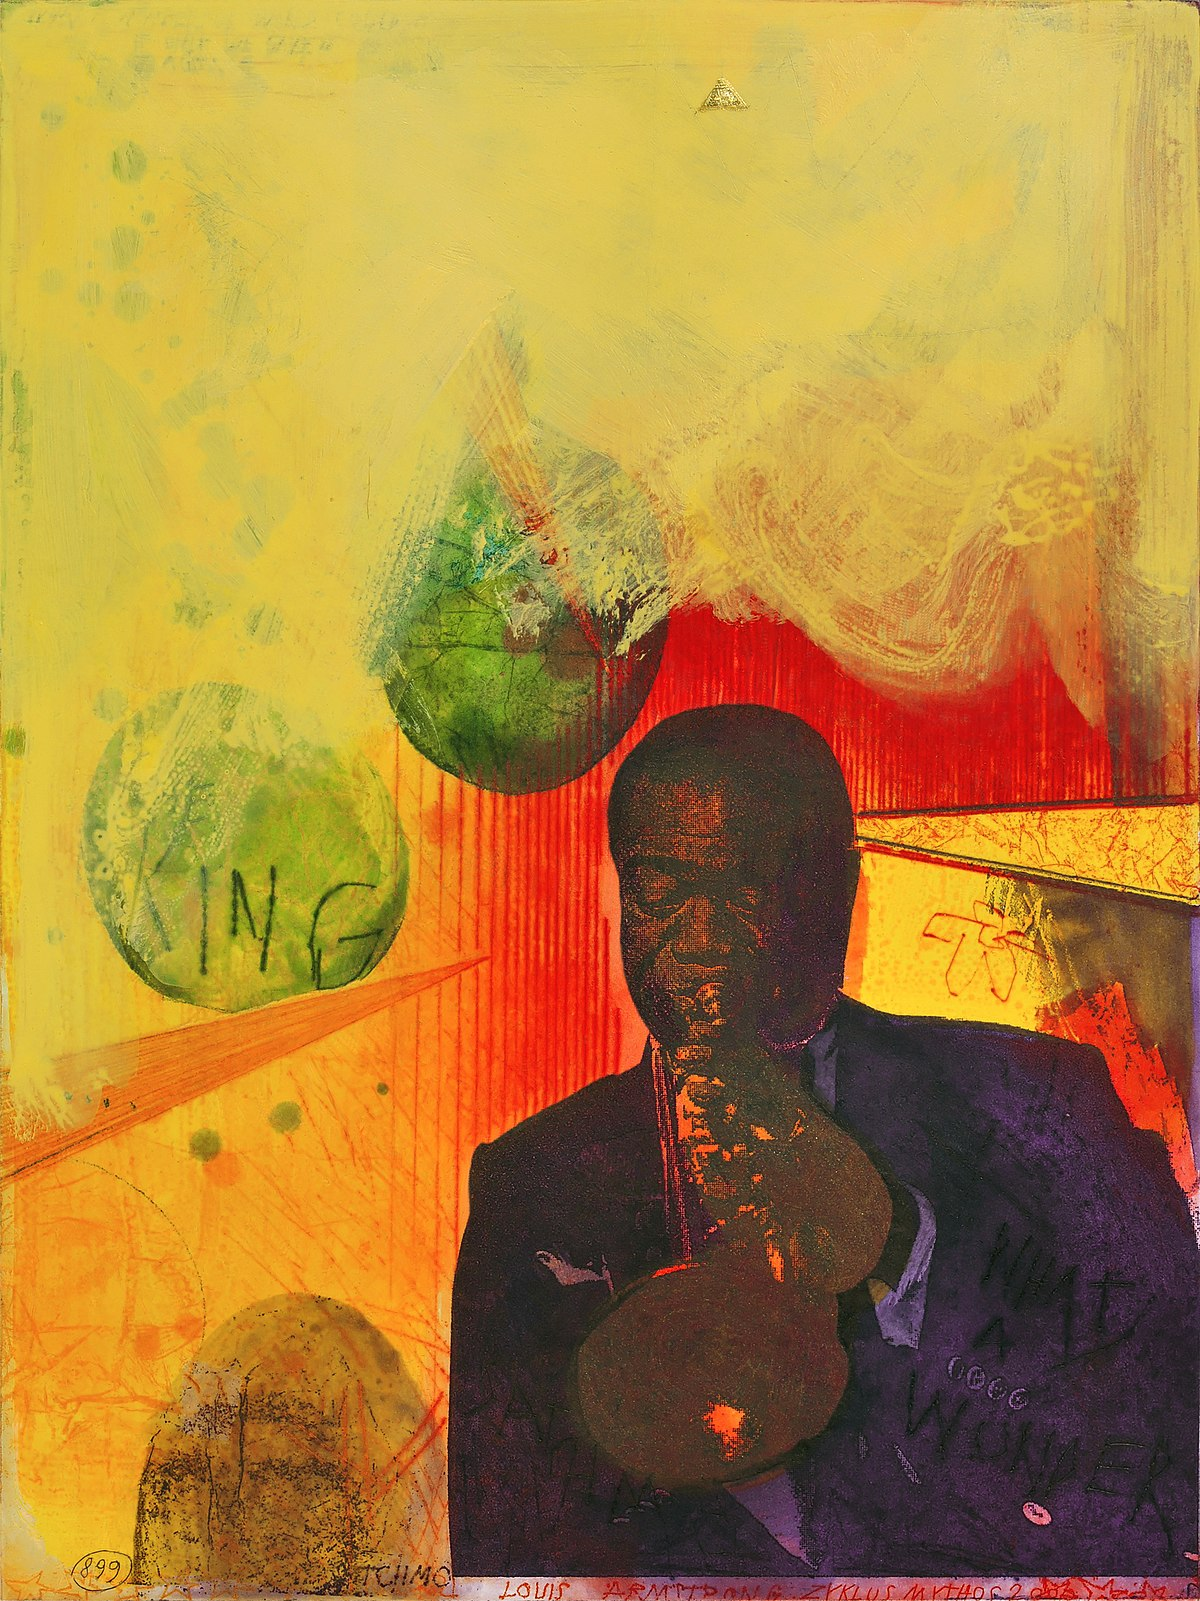 Louis Armstrong Et Son Orchestre Sings The Blues